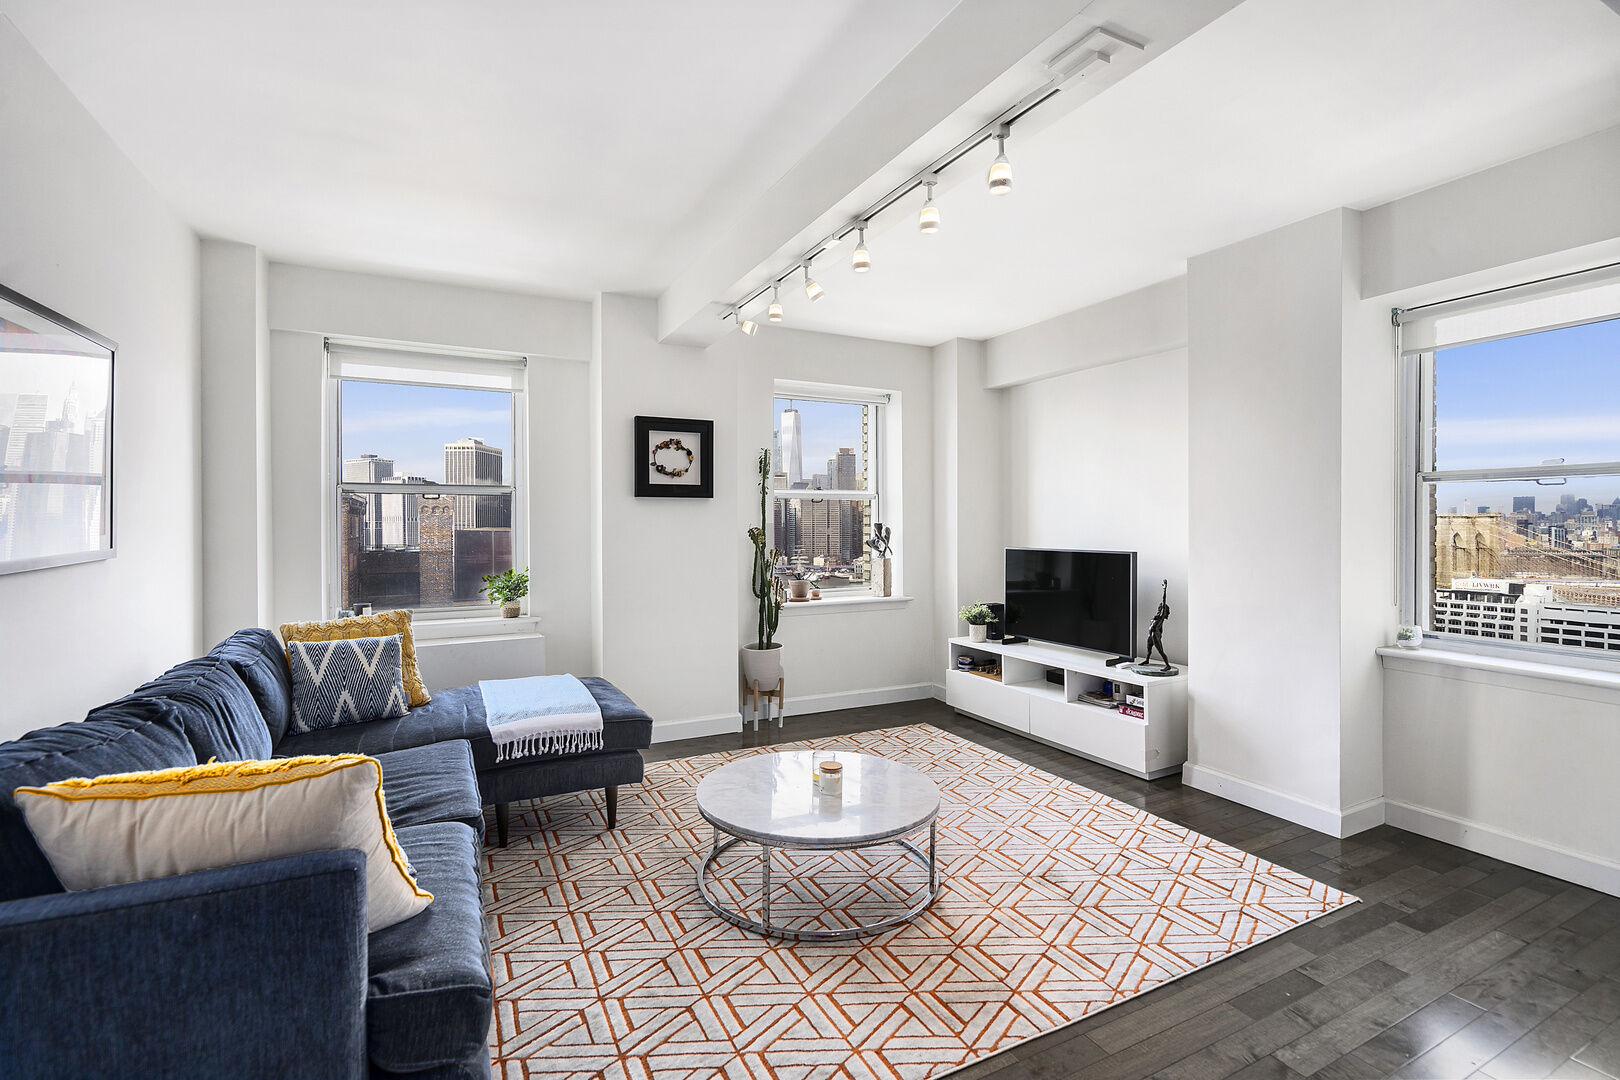 Apartment for sale at 111 Hicks Street, Apt 18-E